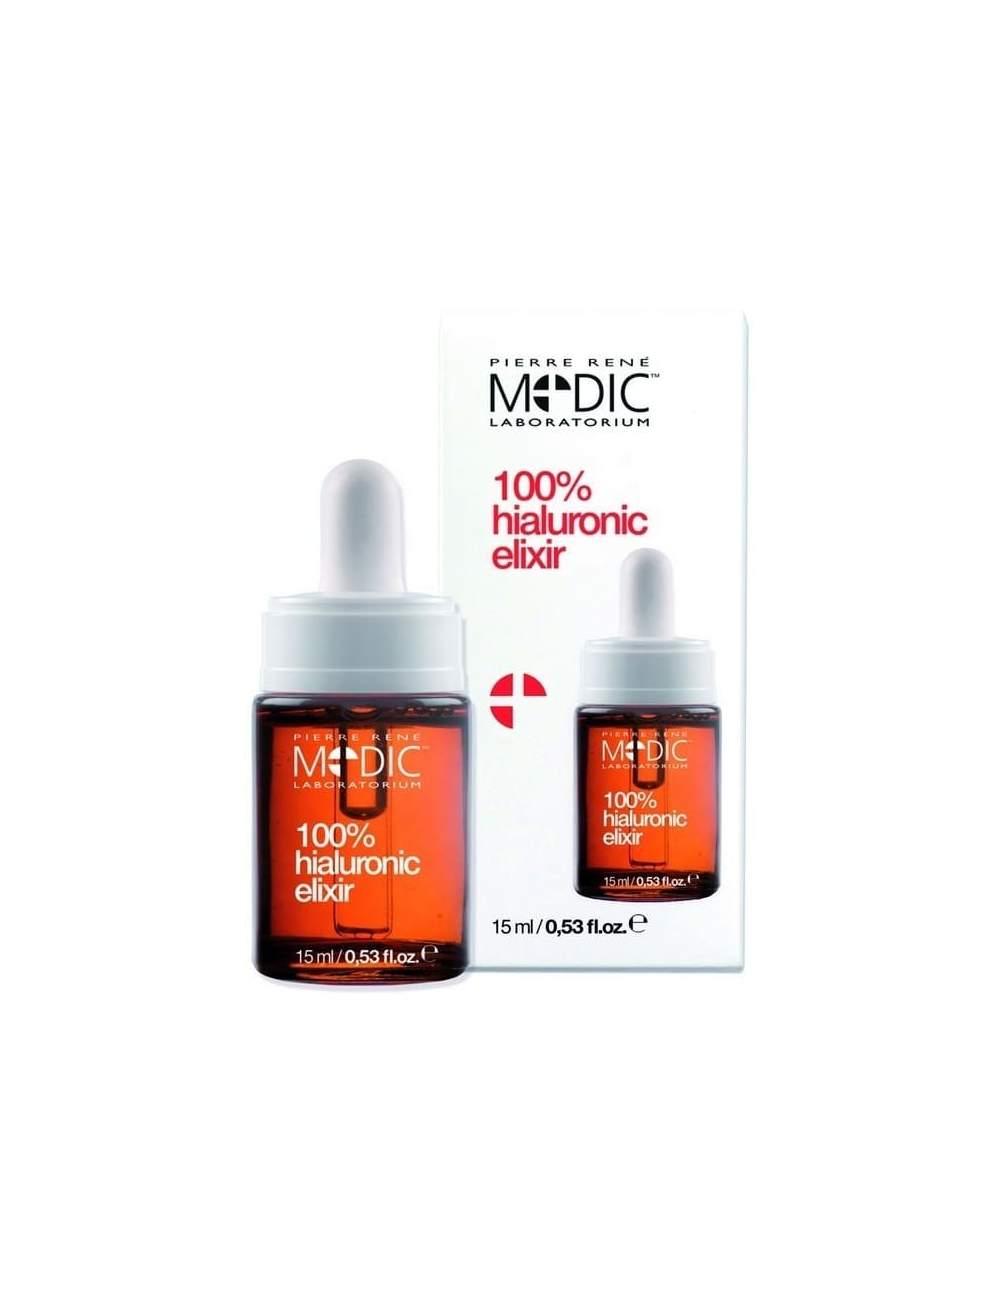 Sérum Facial Elixir 100% Ácido Hialurónico. Pierre René Medic